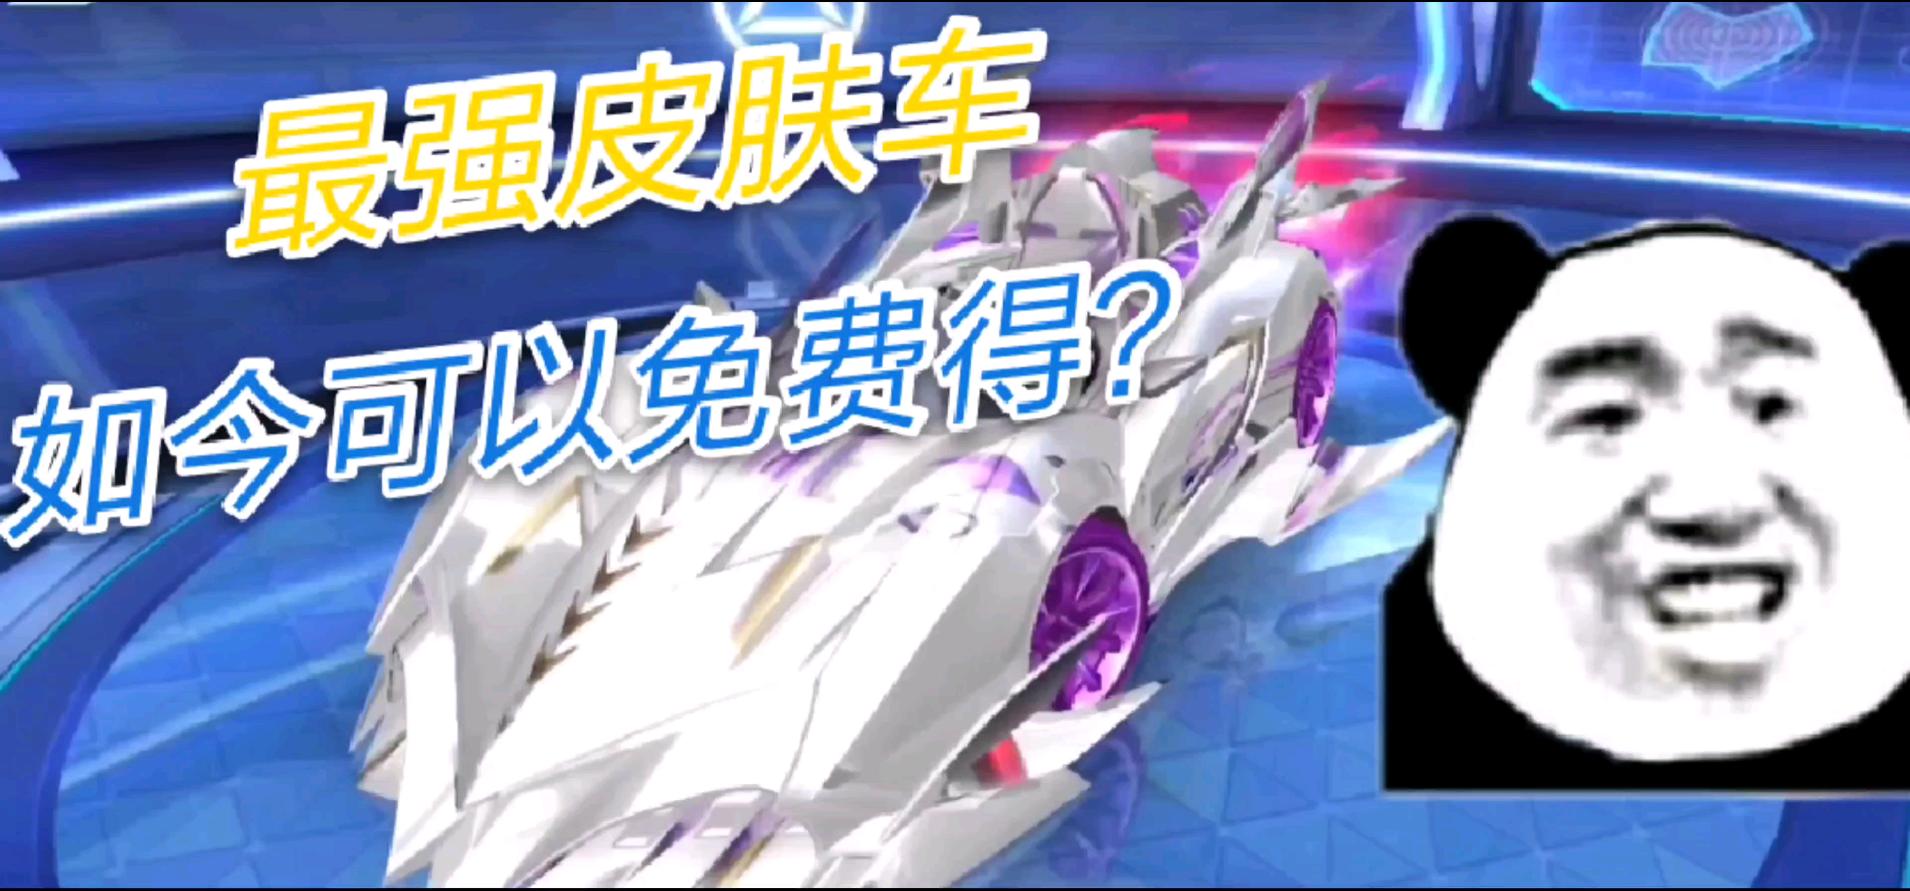 QQ飞车魅影王爵